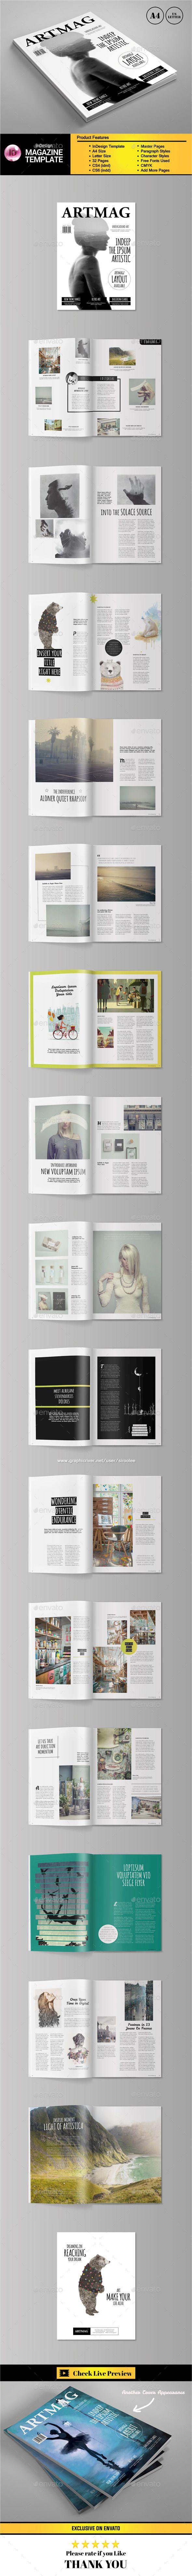 Art Magazine Template #design Buy Now: http://graphicriver.net/item/art-magazine-template-vol2/12872857?ref=ksioks